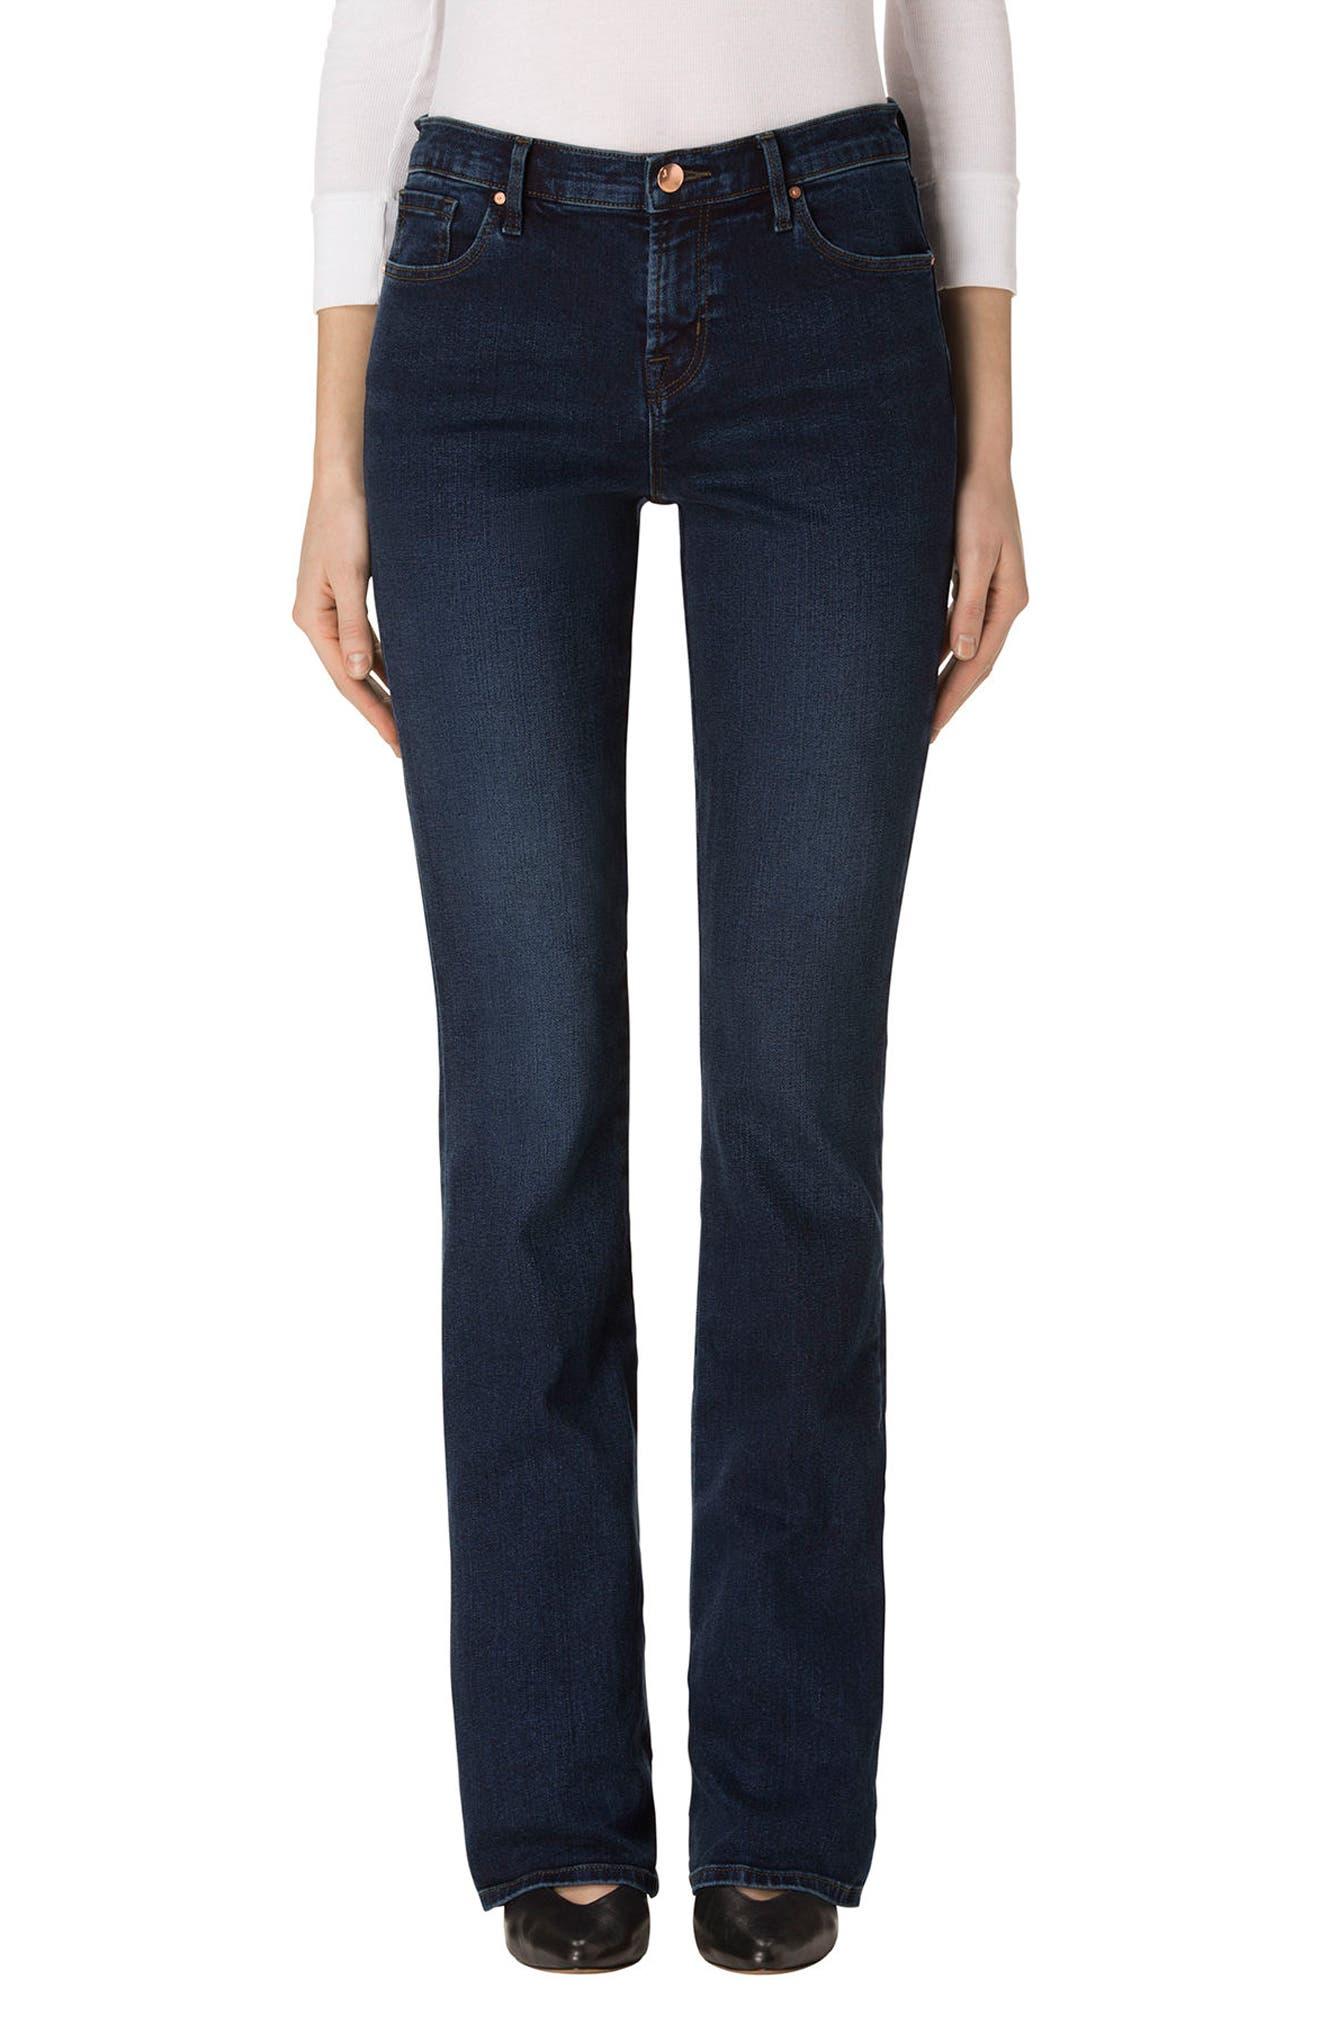 Litah Bootcut Jeans,                         Main,                         color, Throne